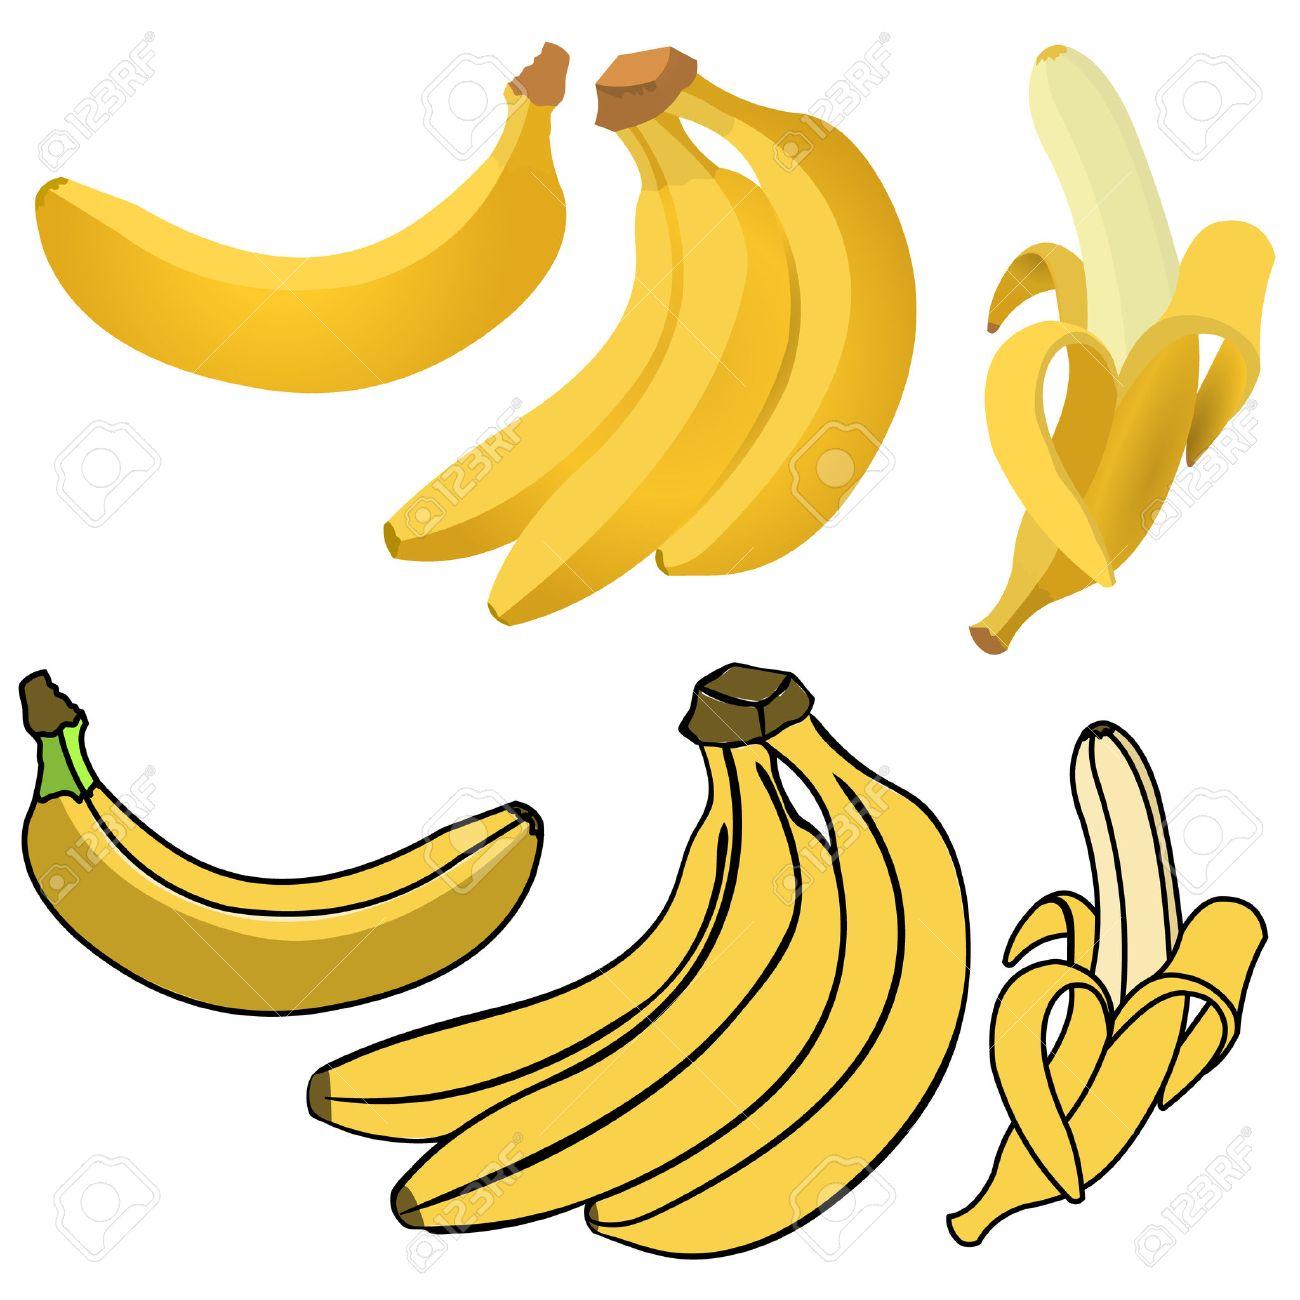 Set of Yellow Bananas. Single Banana , Peeled Banana, Bunch of Bananas. - 46627268